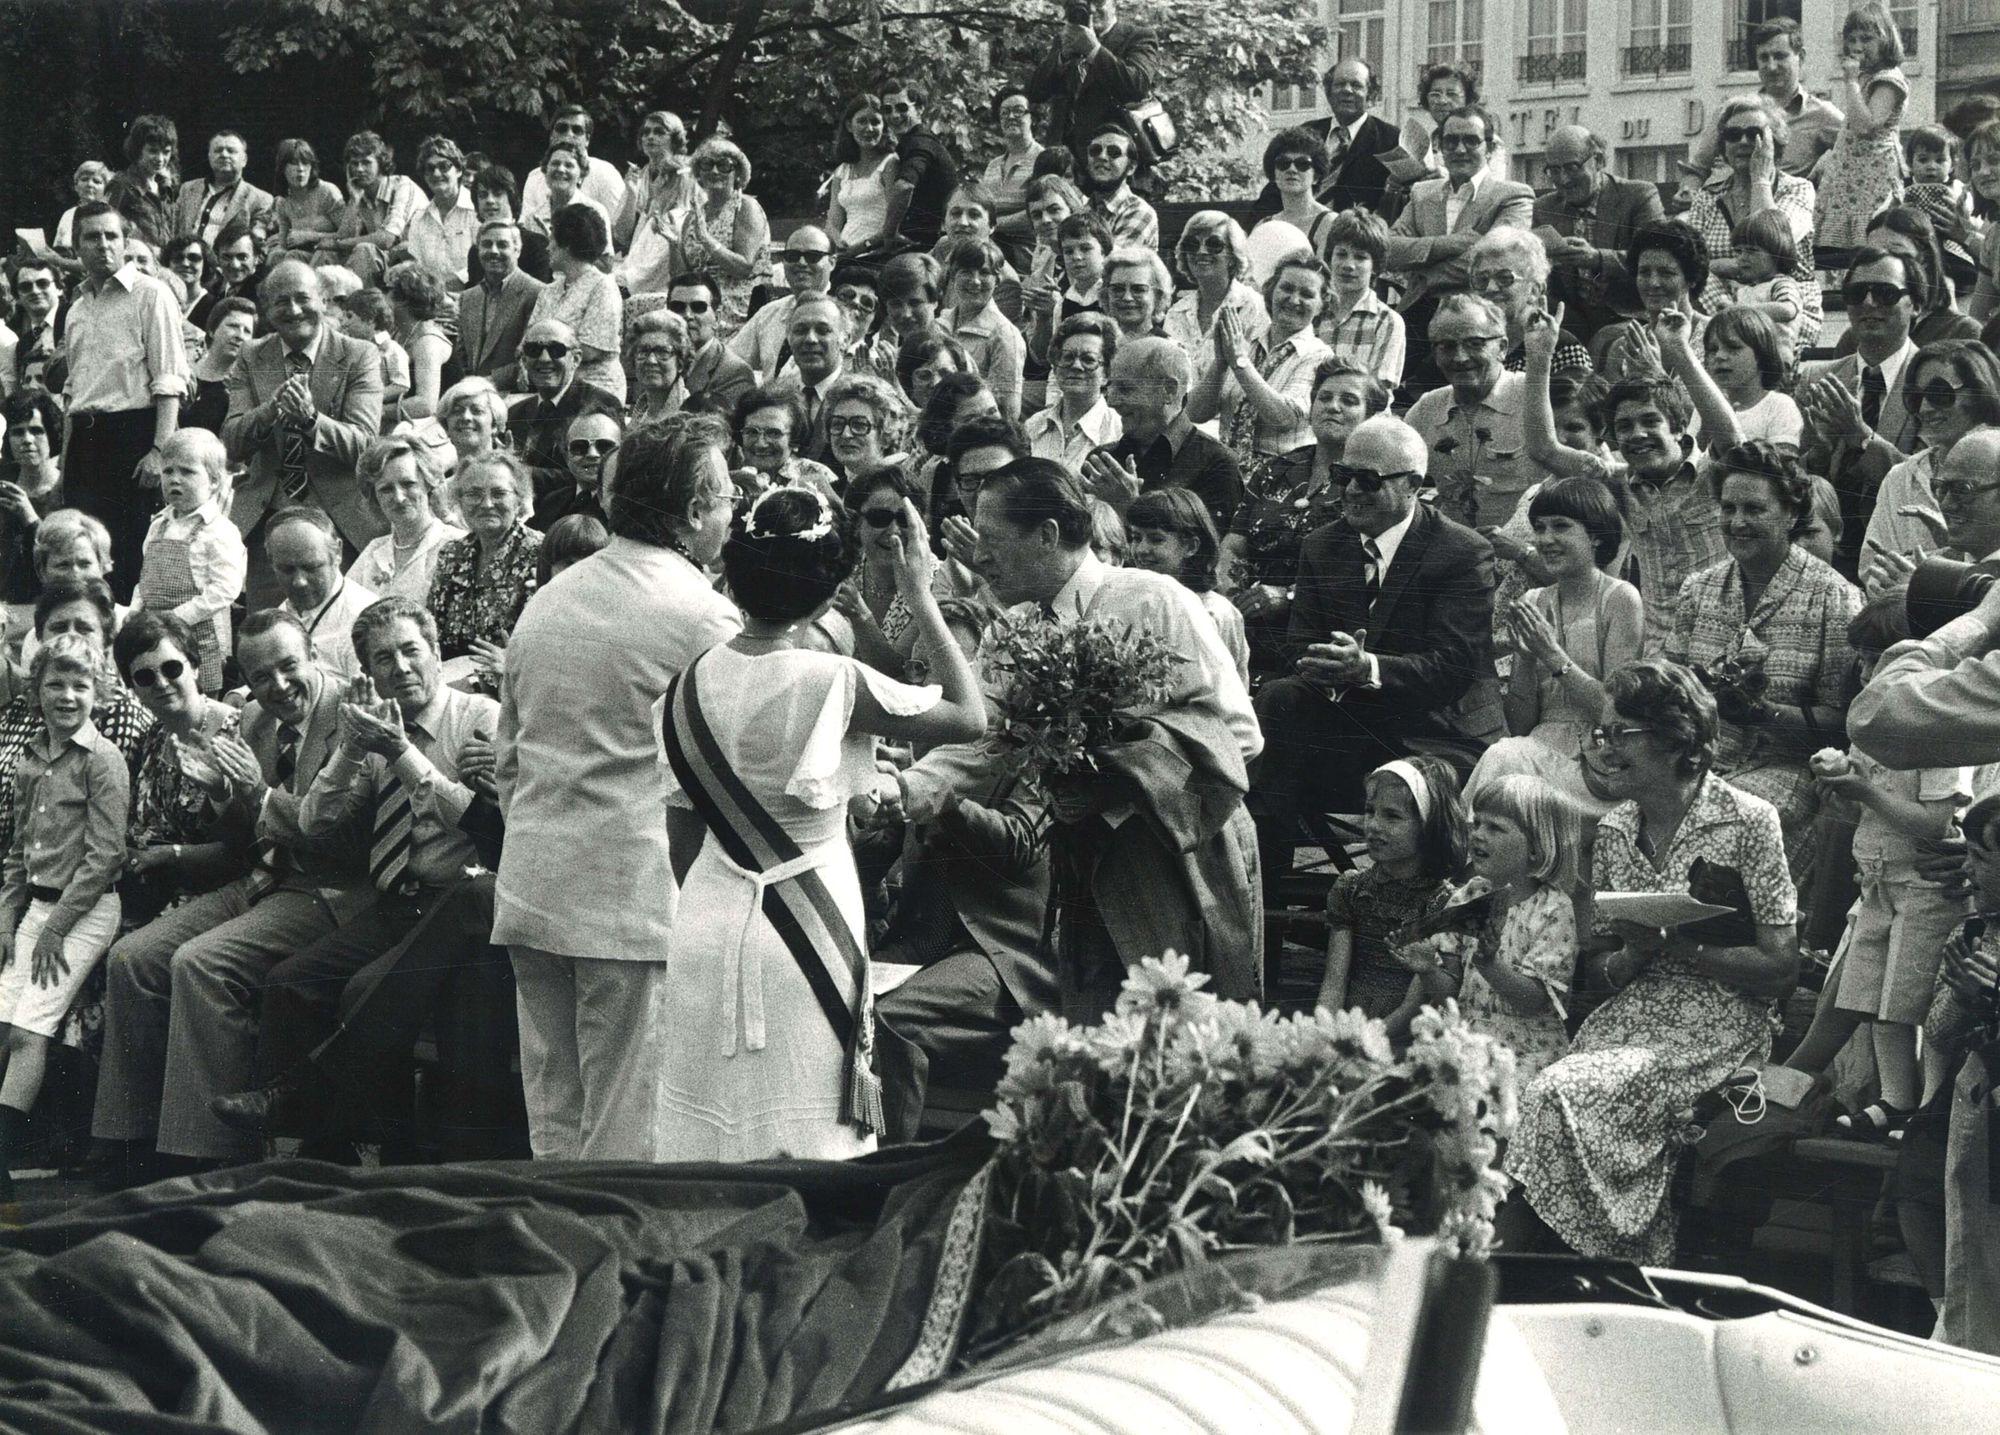 Groenten- en fruitkoningin 1973